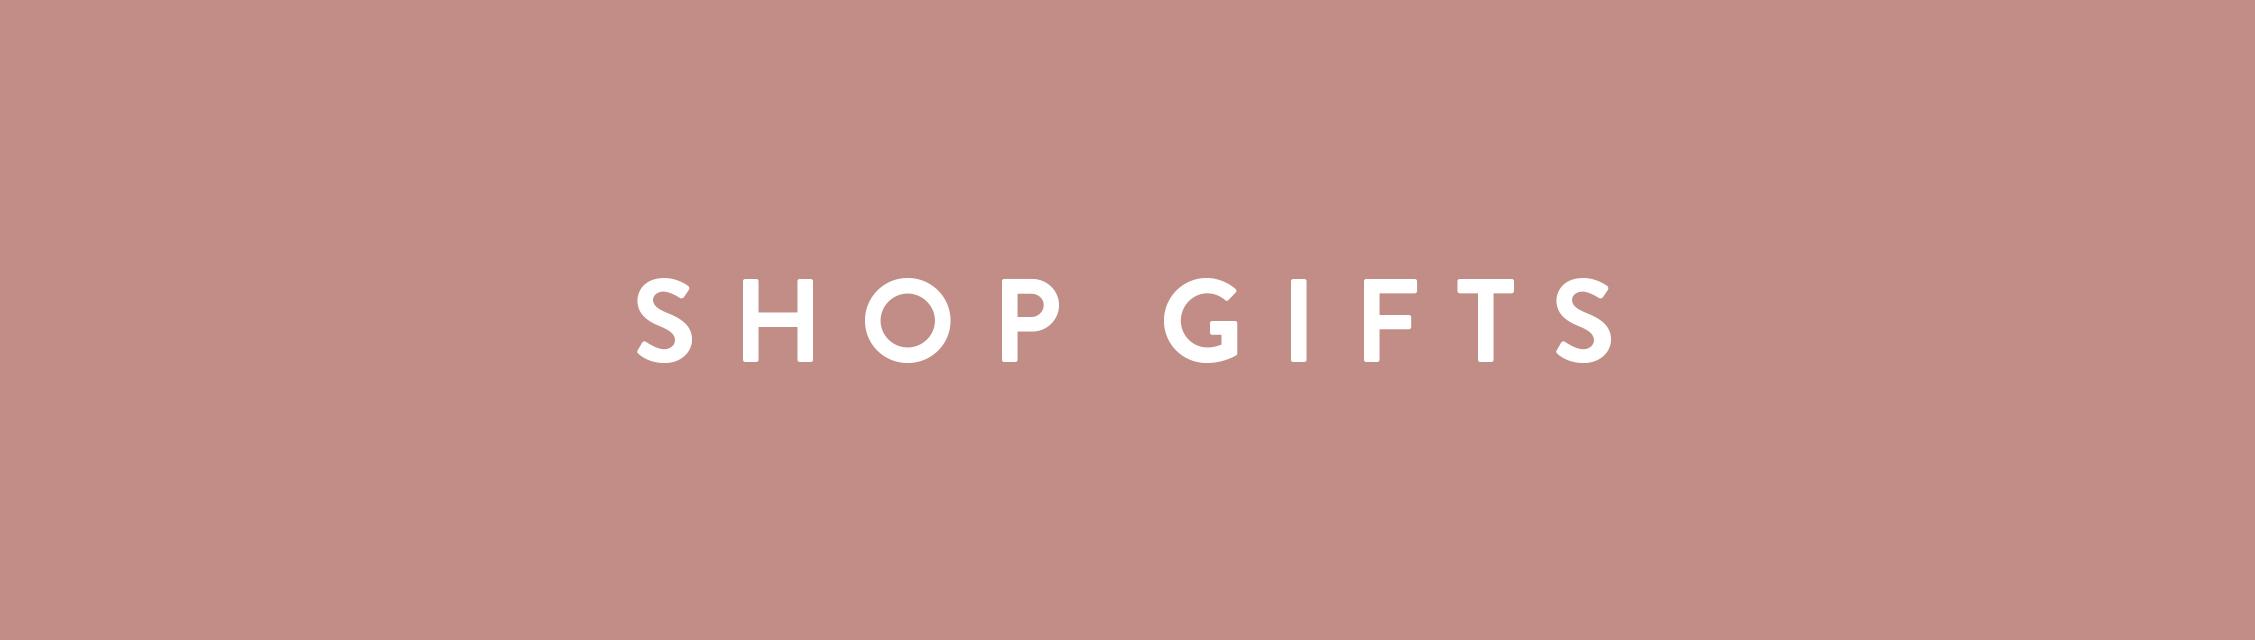 shop_gifts.jpg